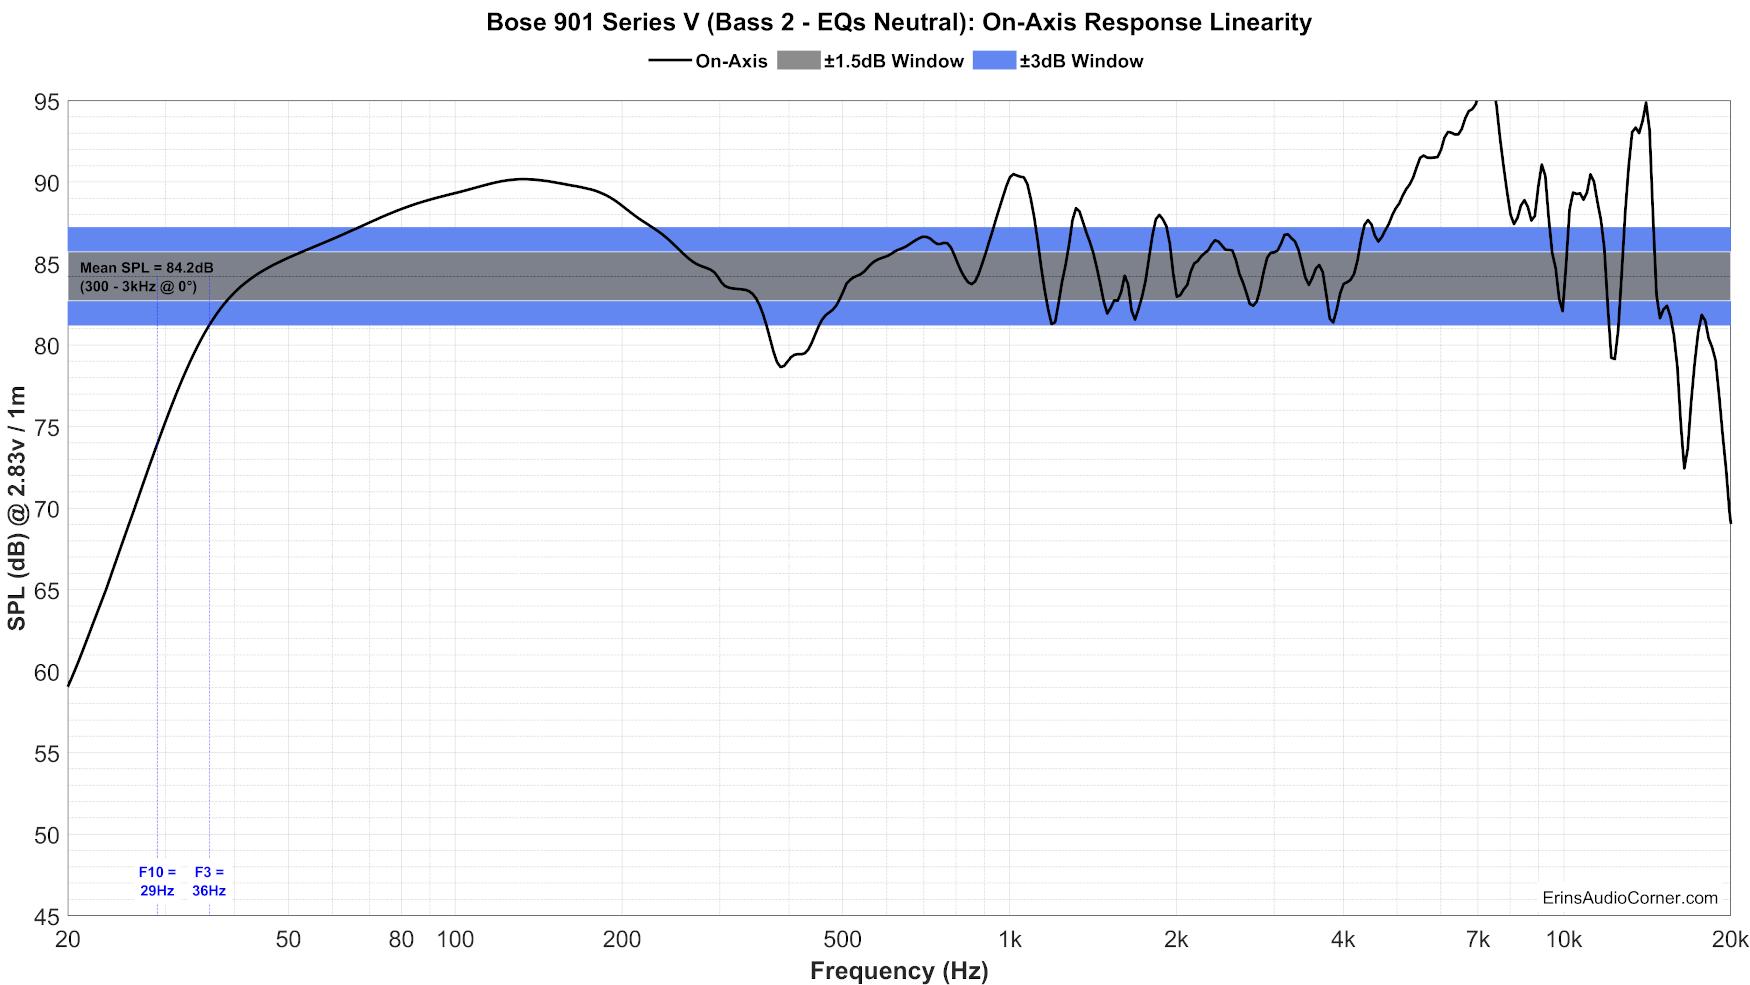 Bose%20901%20Series%20V%20(Bass%202%20-%20EQs%20Neutral)%20FR_Linearity.png